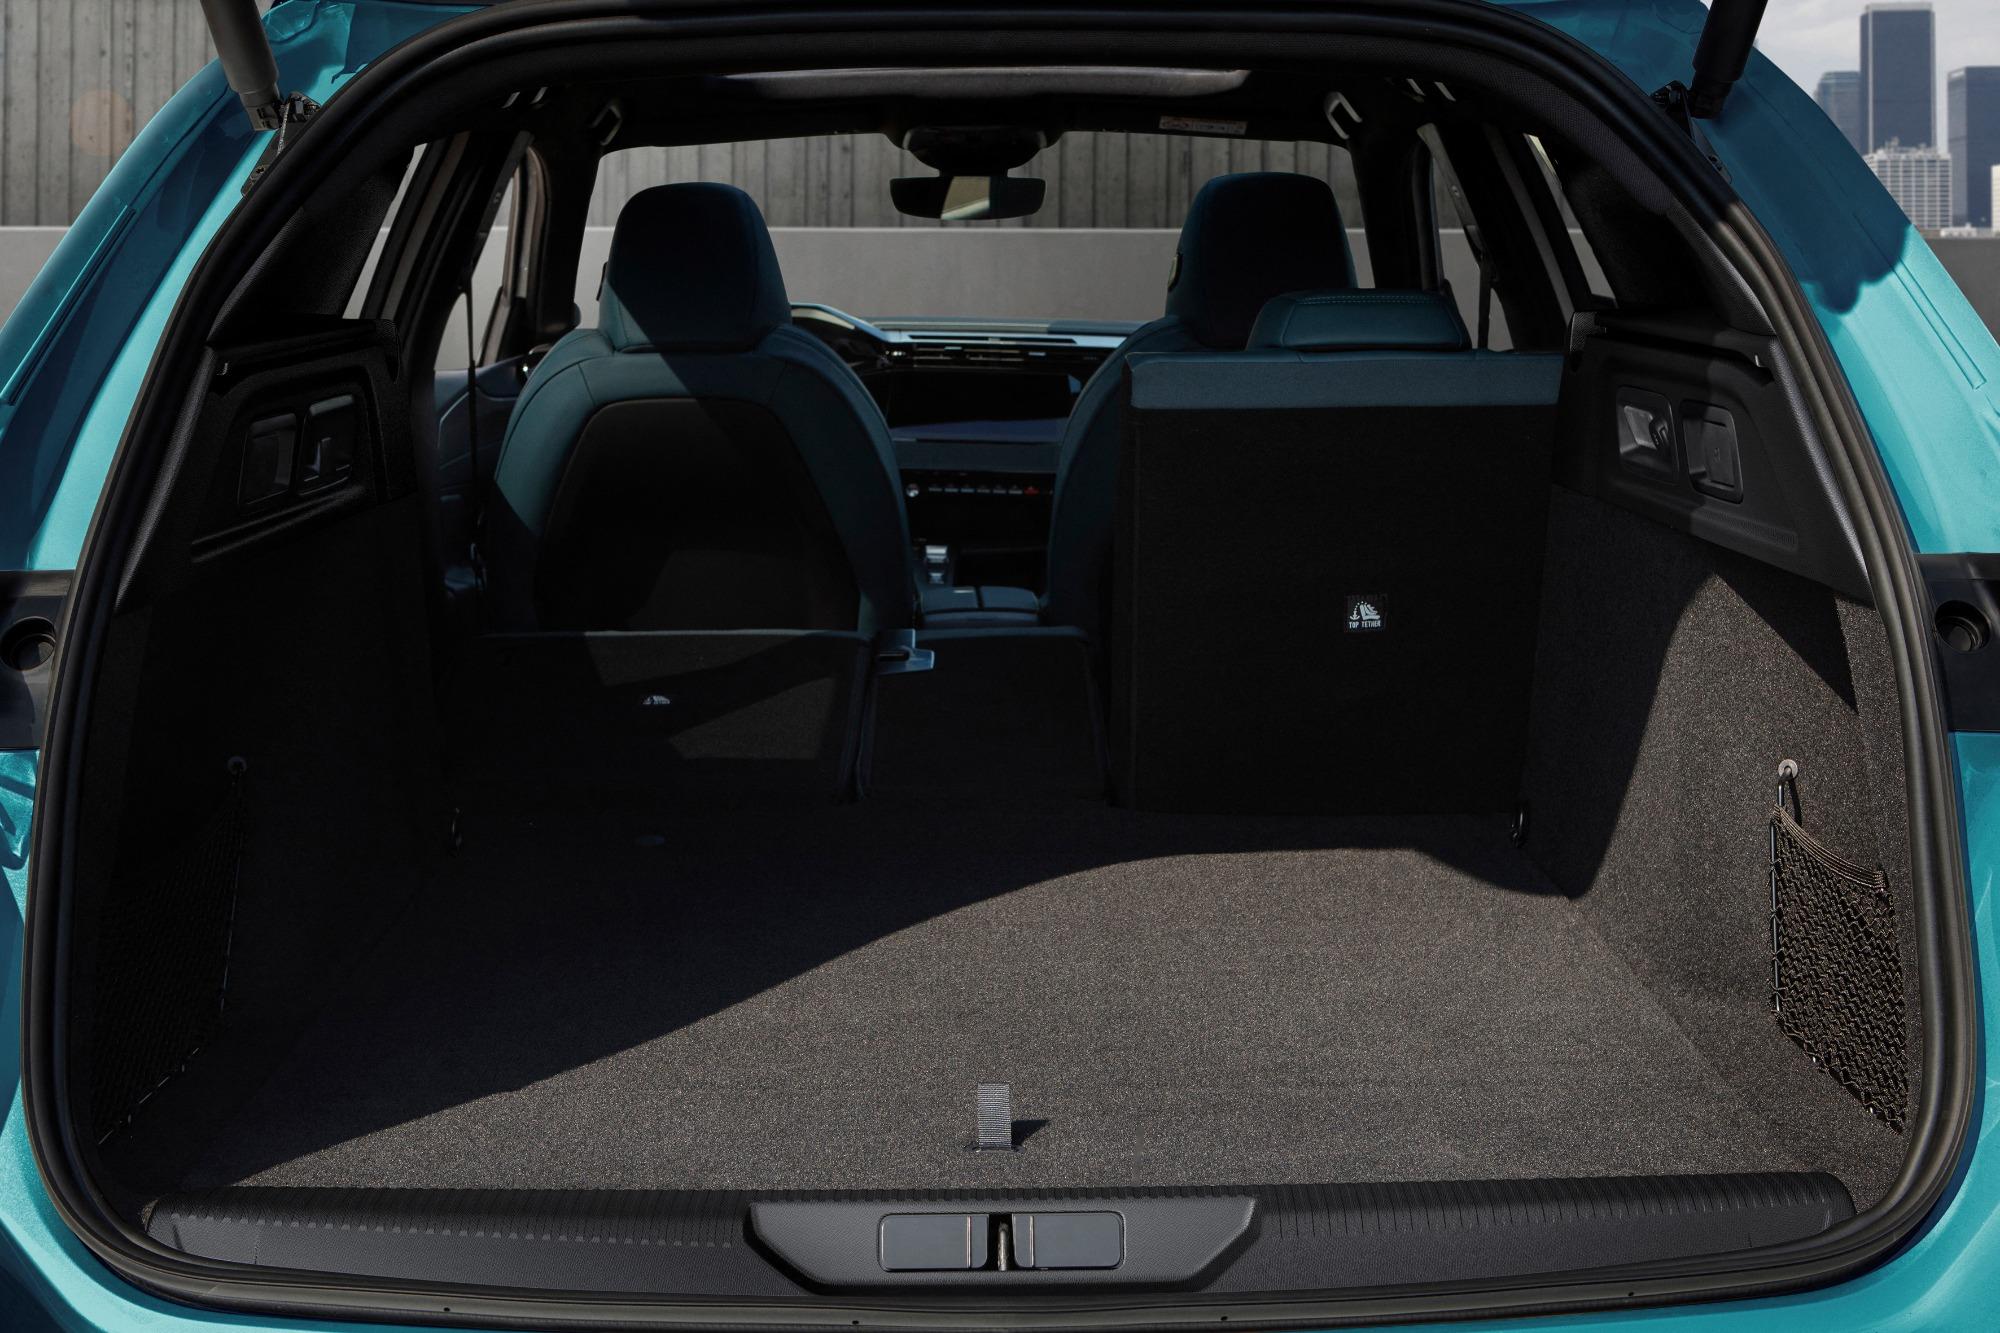 Porta-malas do Peugeot 308 SW 2021